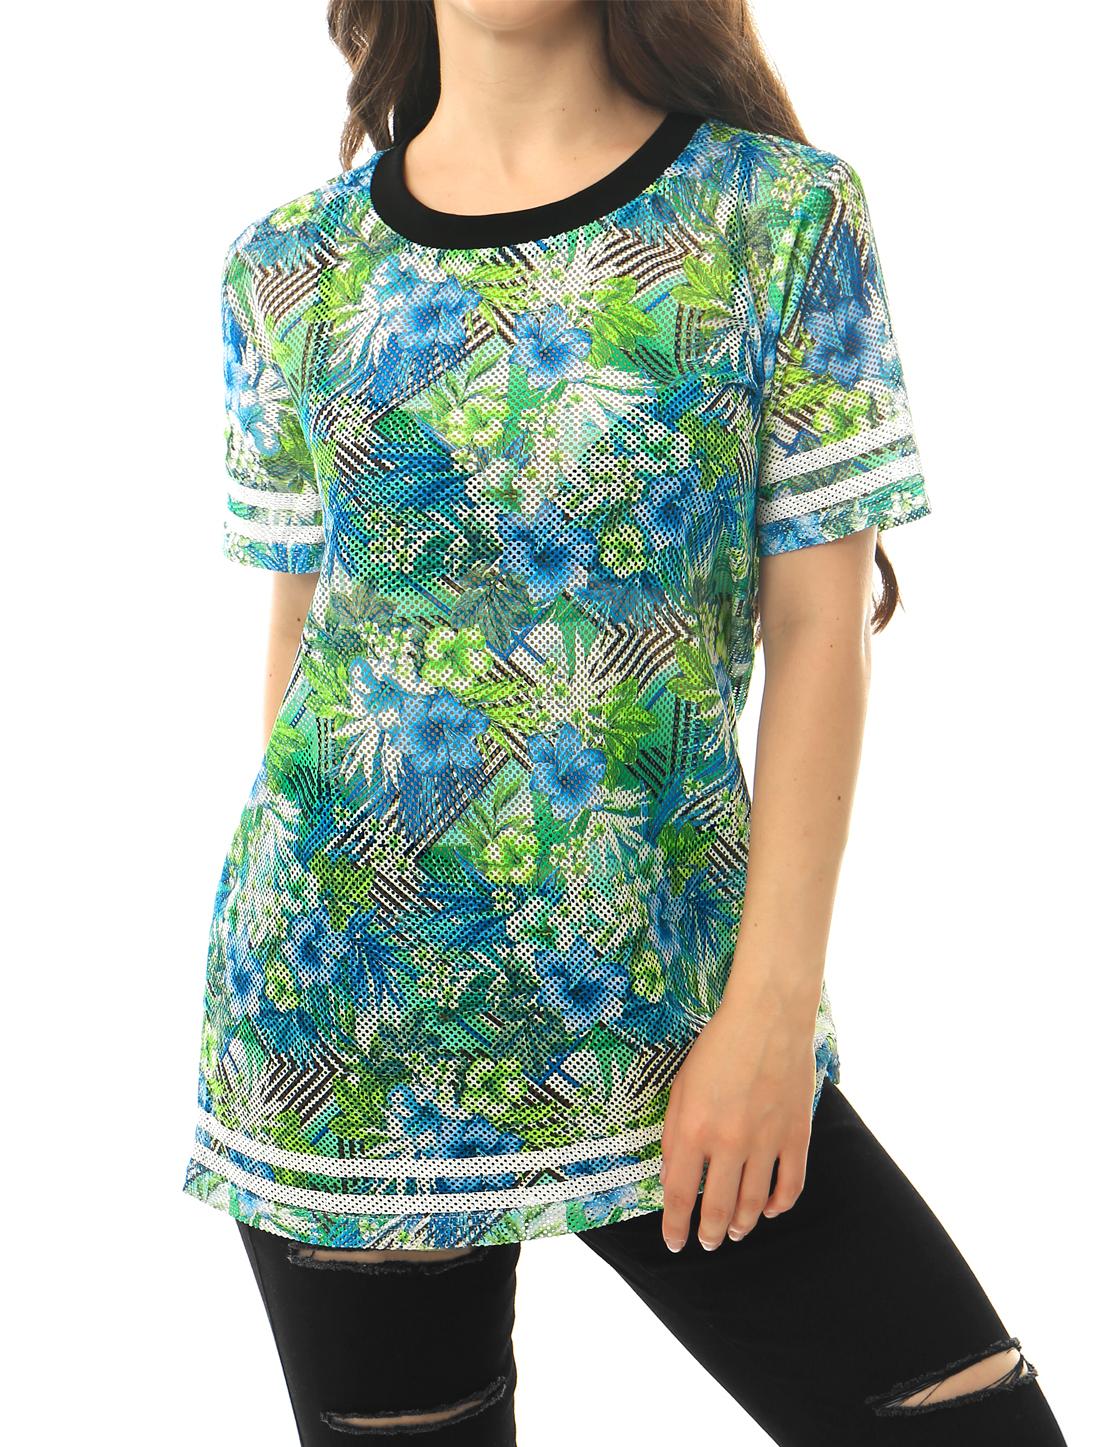 Women Short Sleeves Stripes Trim Floral Mesh Top Blue Green S